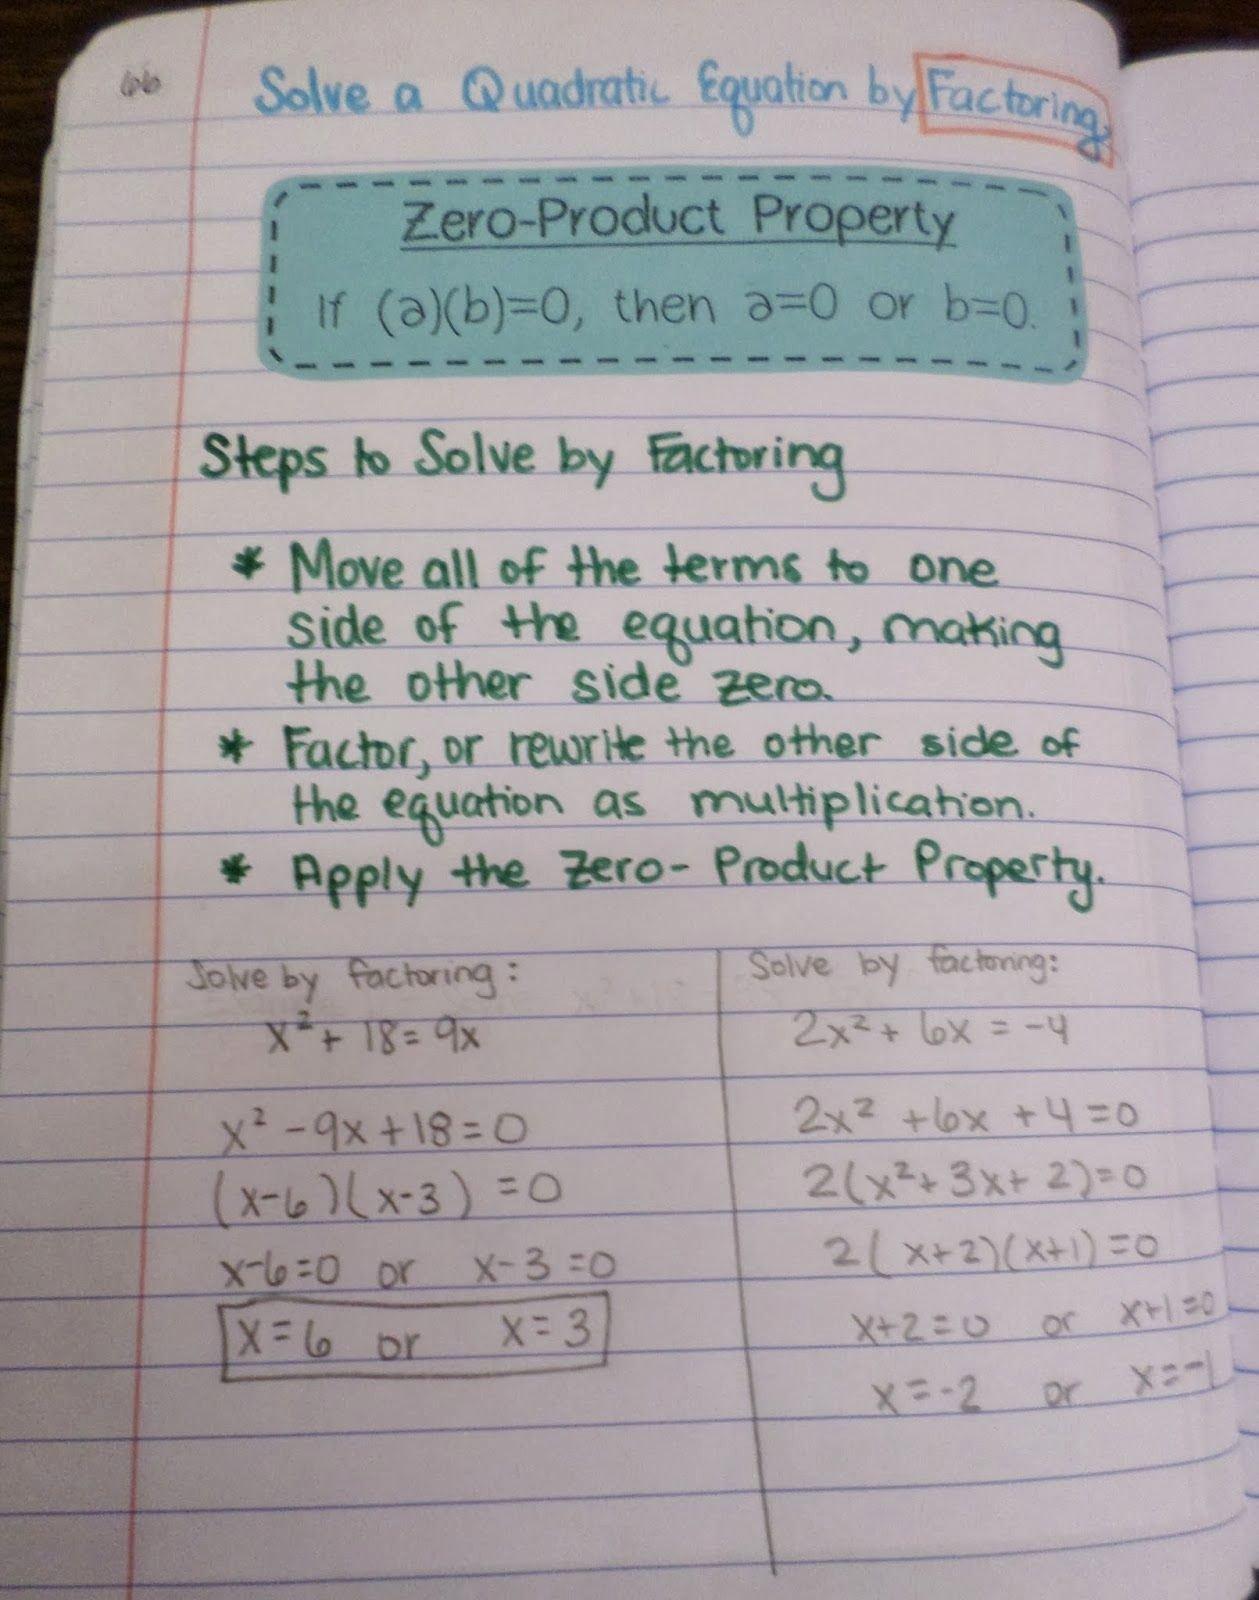 46 Solve Quadratics By Factoring Worksheet